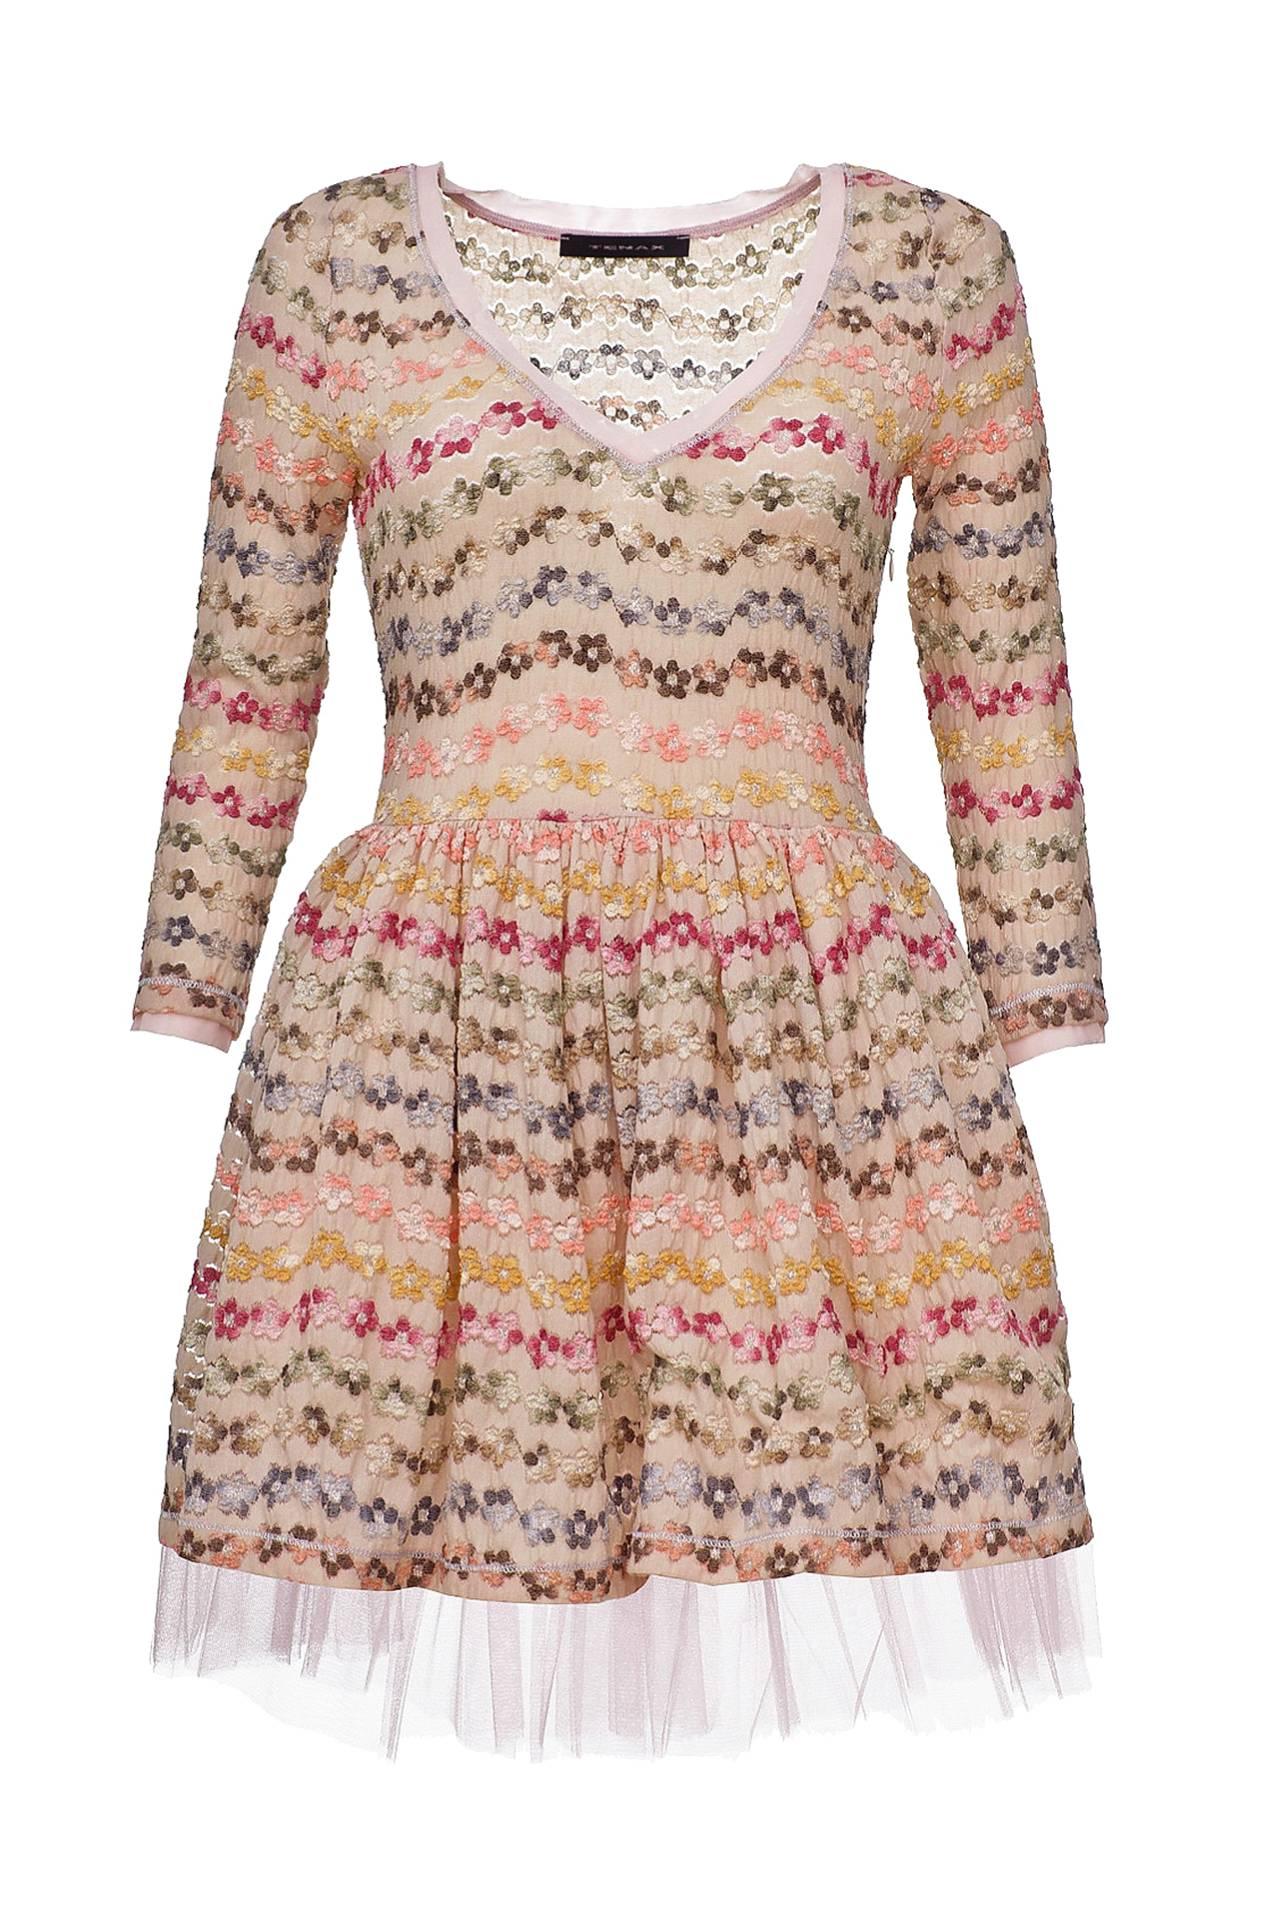 Платье TENAX платье футляр с оборкой из сетки red valentino